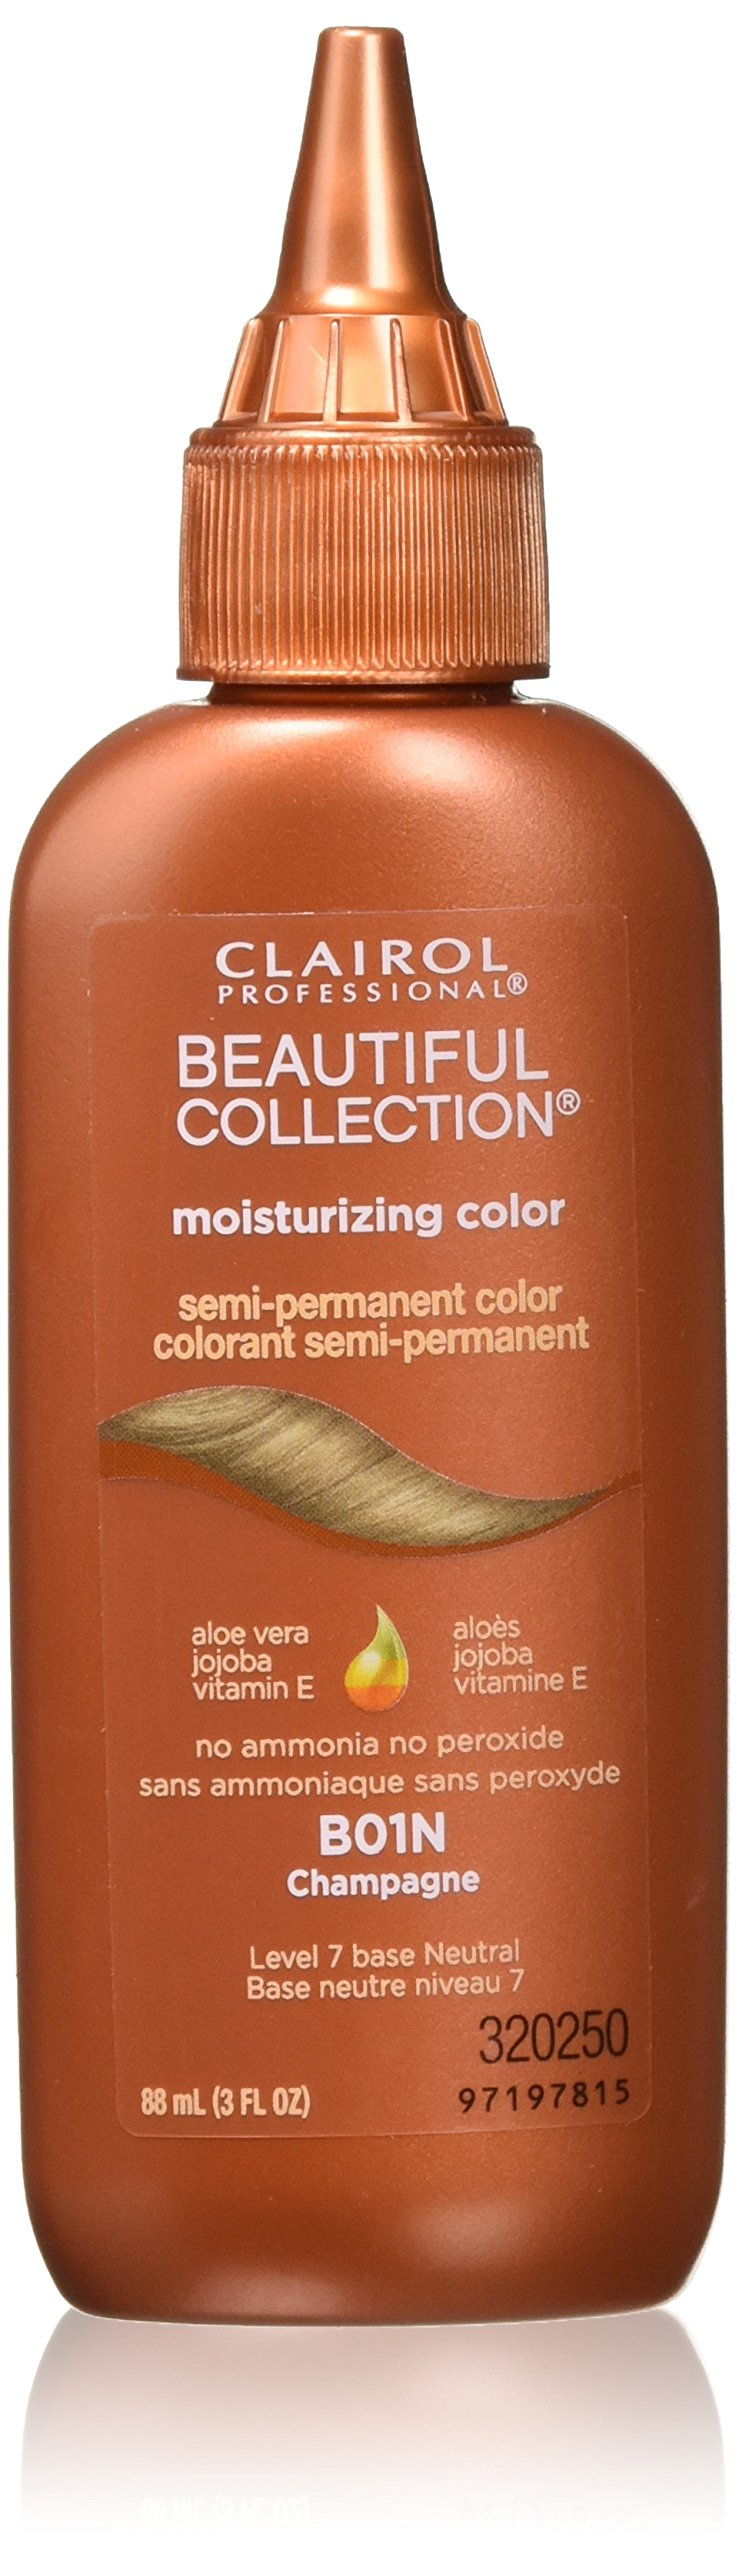 Elegant Clairol Beautiful Collection Semi Permanent Hair Color